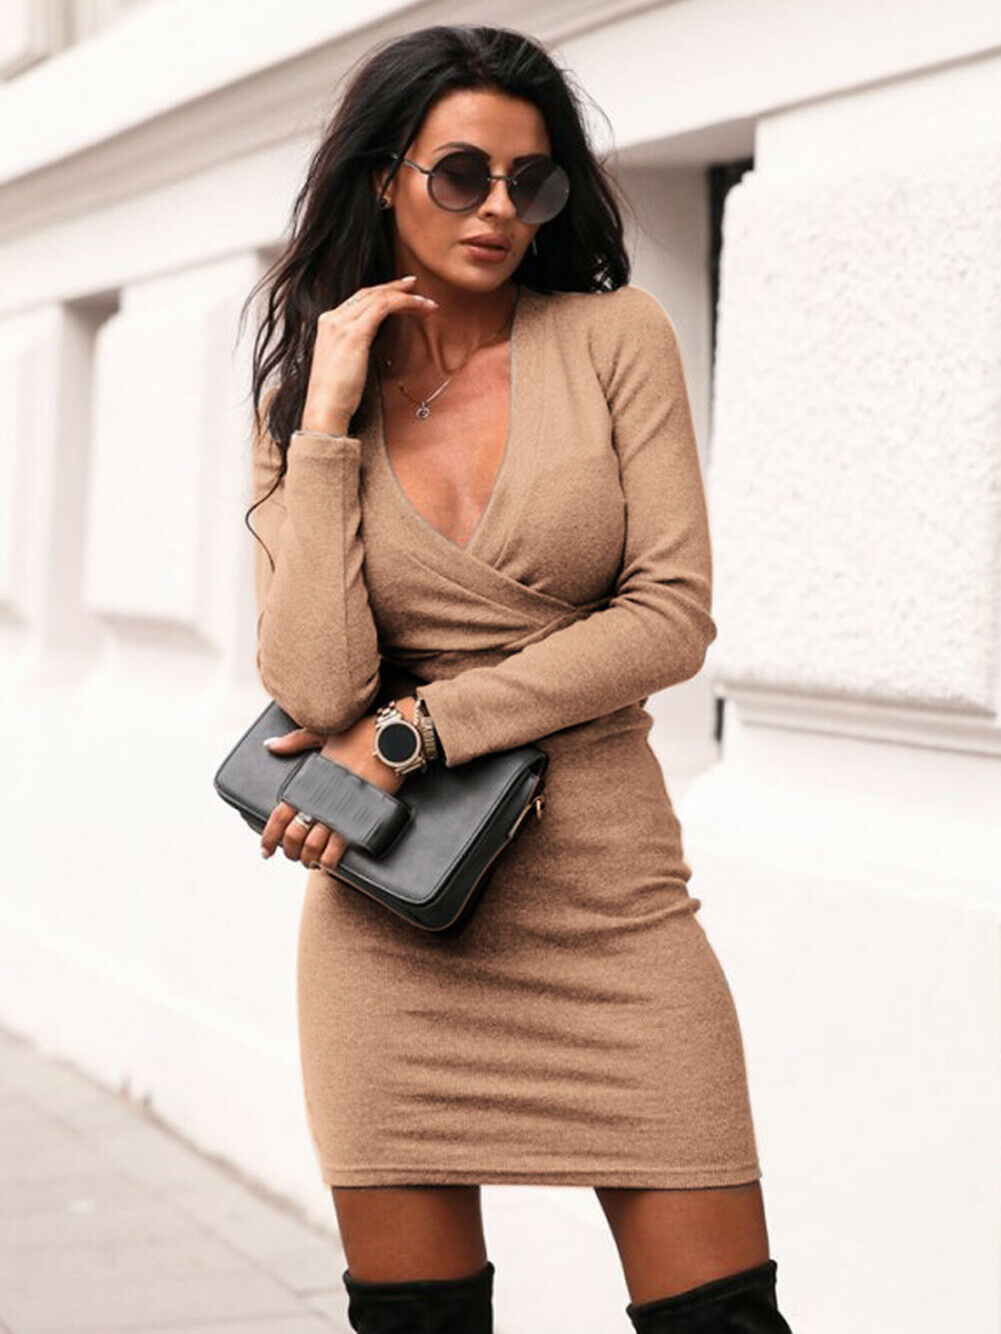 Women Club Bodycon Dress 2019 New Style Long Sleeve Deep V Neck Sexy Night Club Wear Black Blue Celebrity Party Dresses S-XL